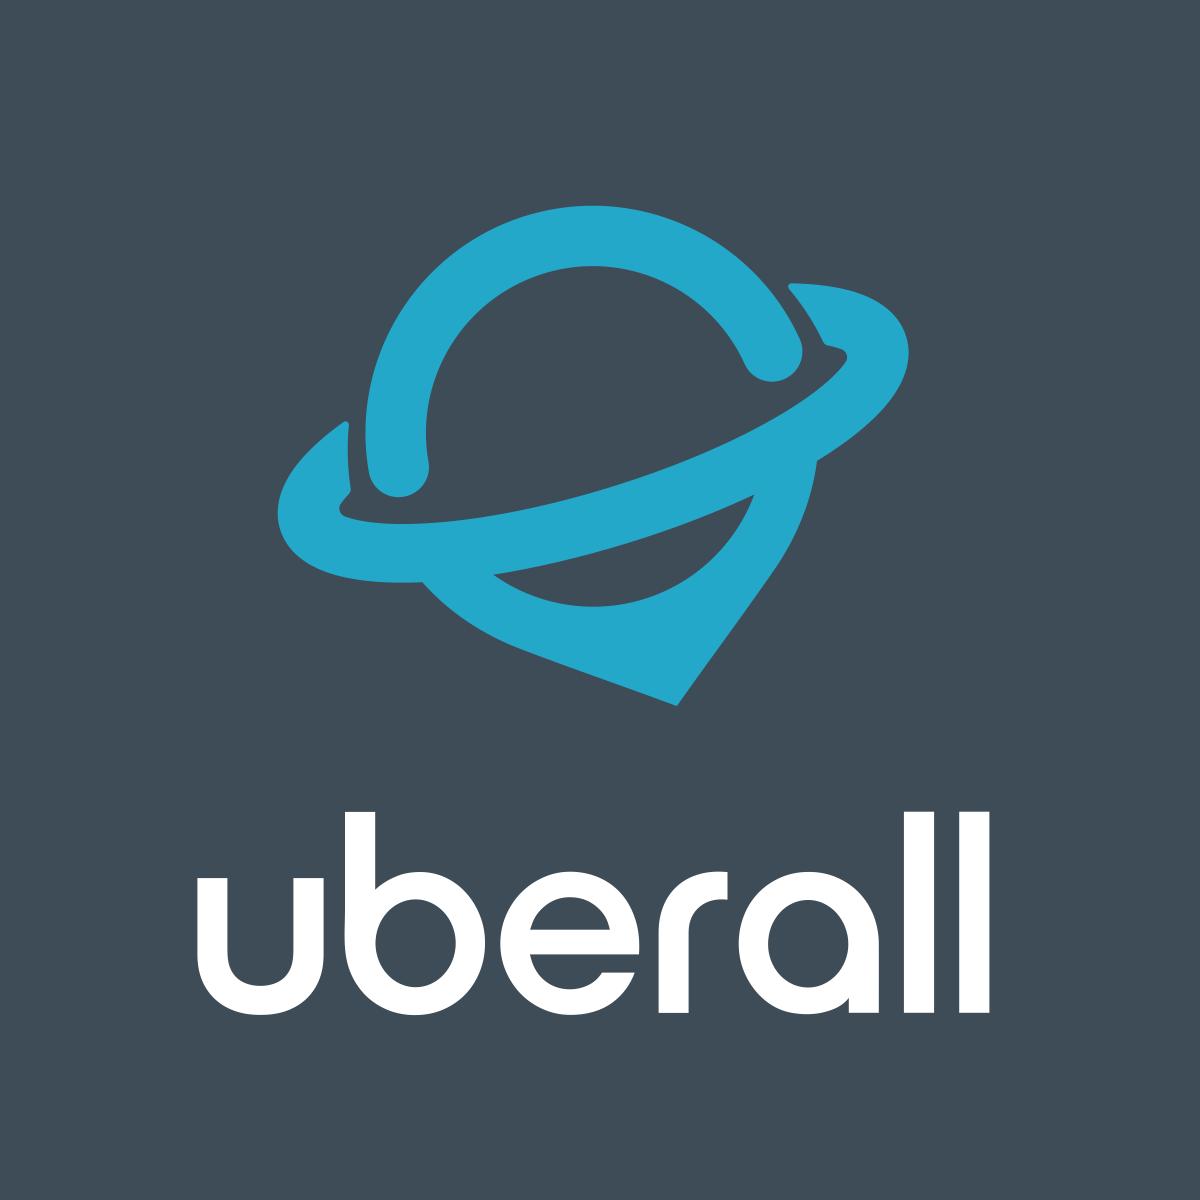 squared-logo-reversed